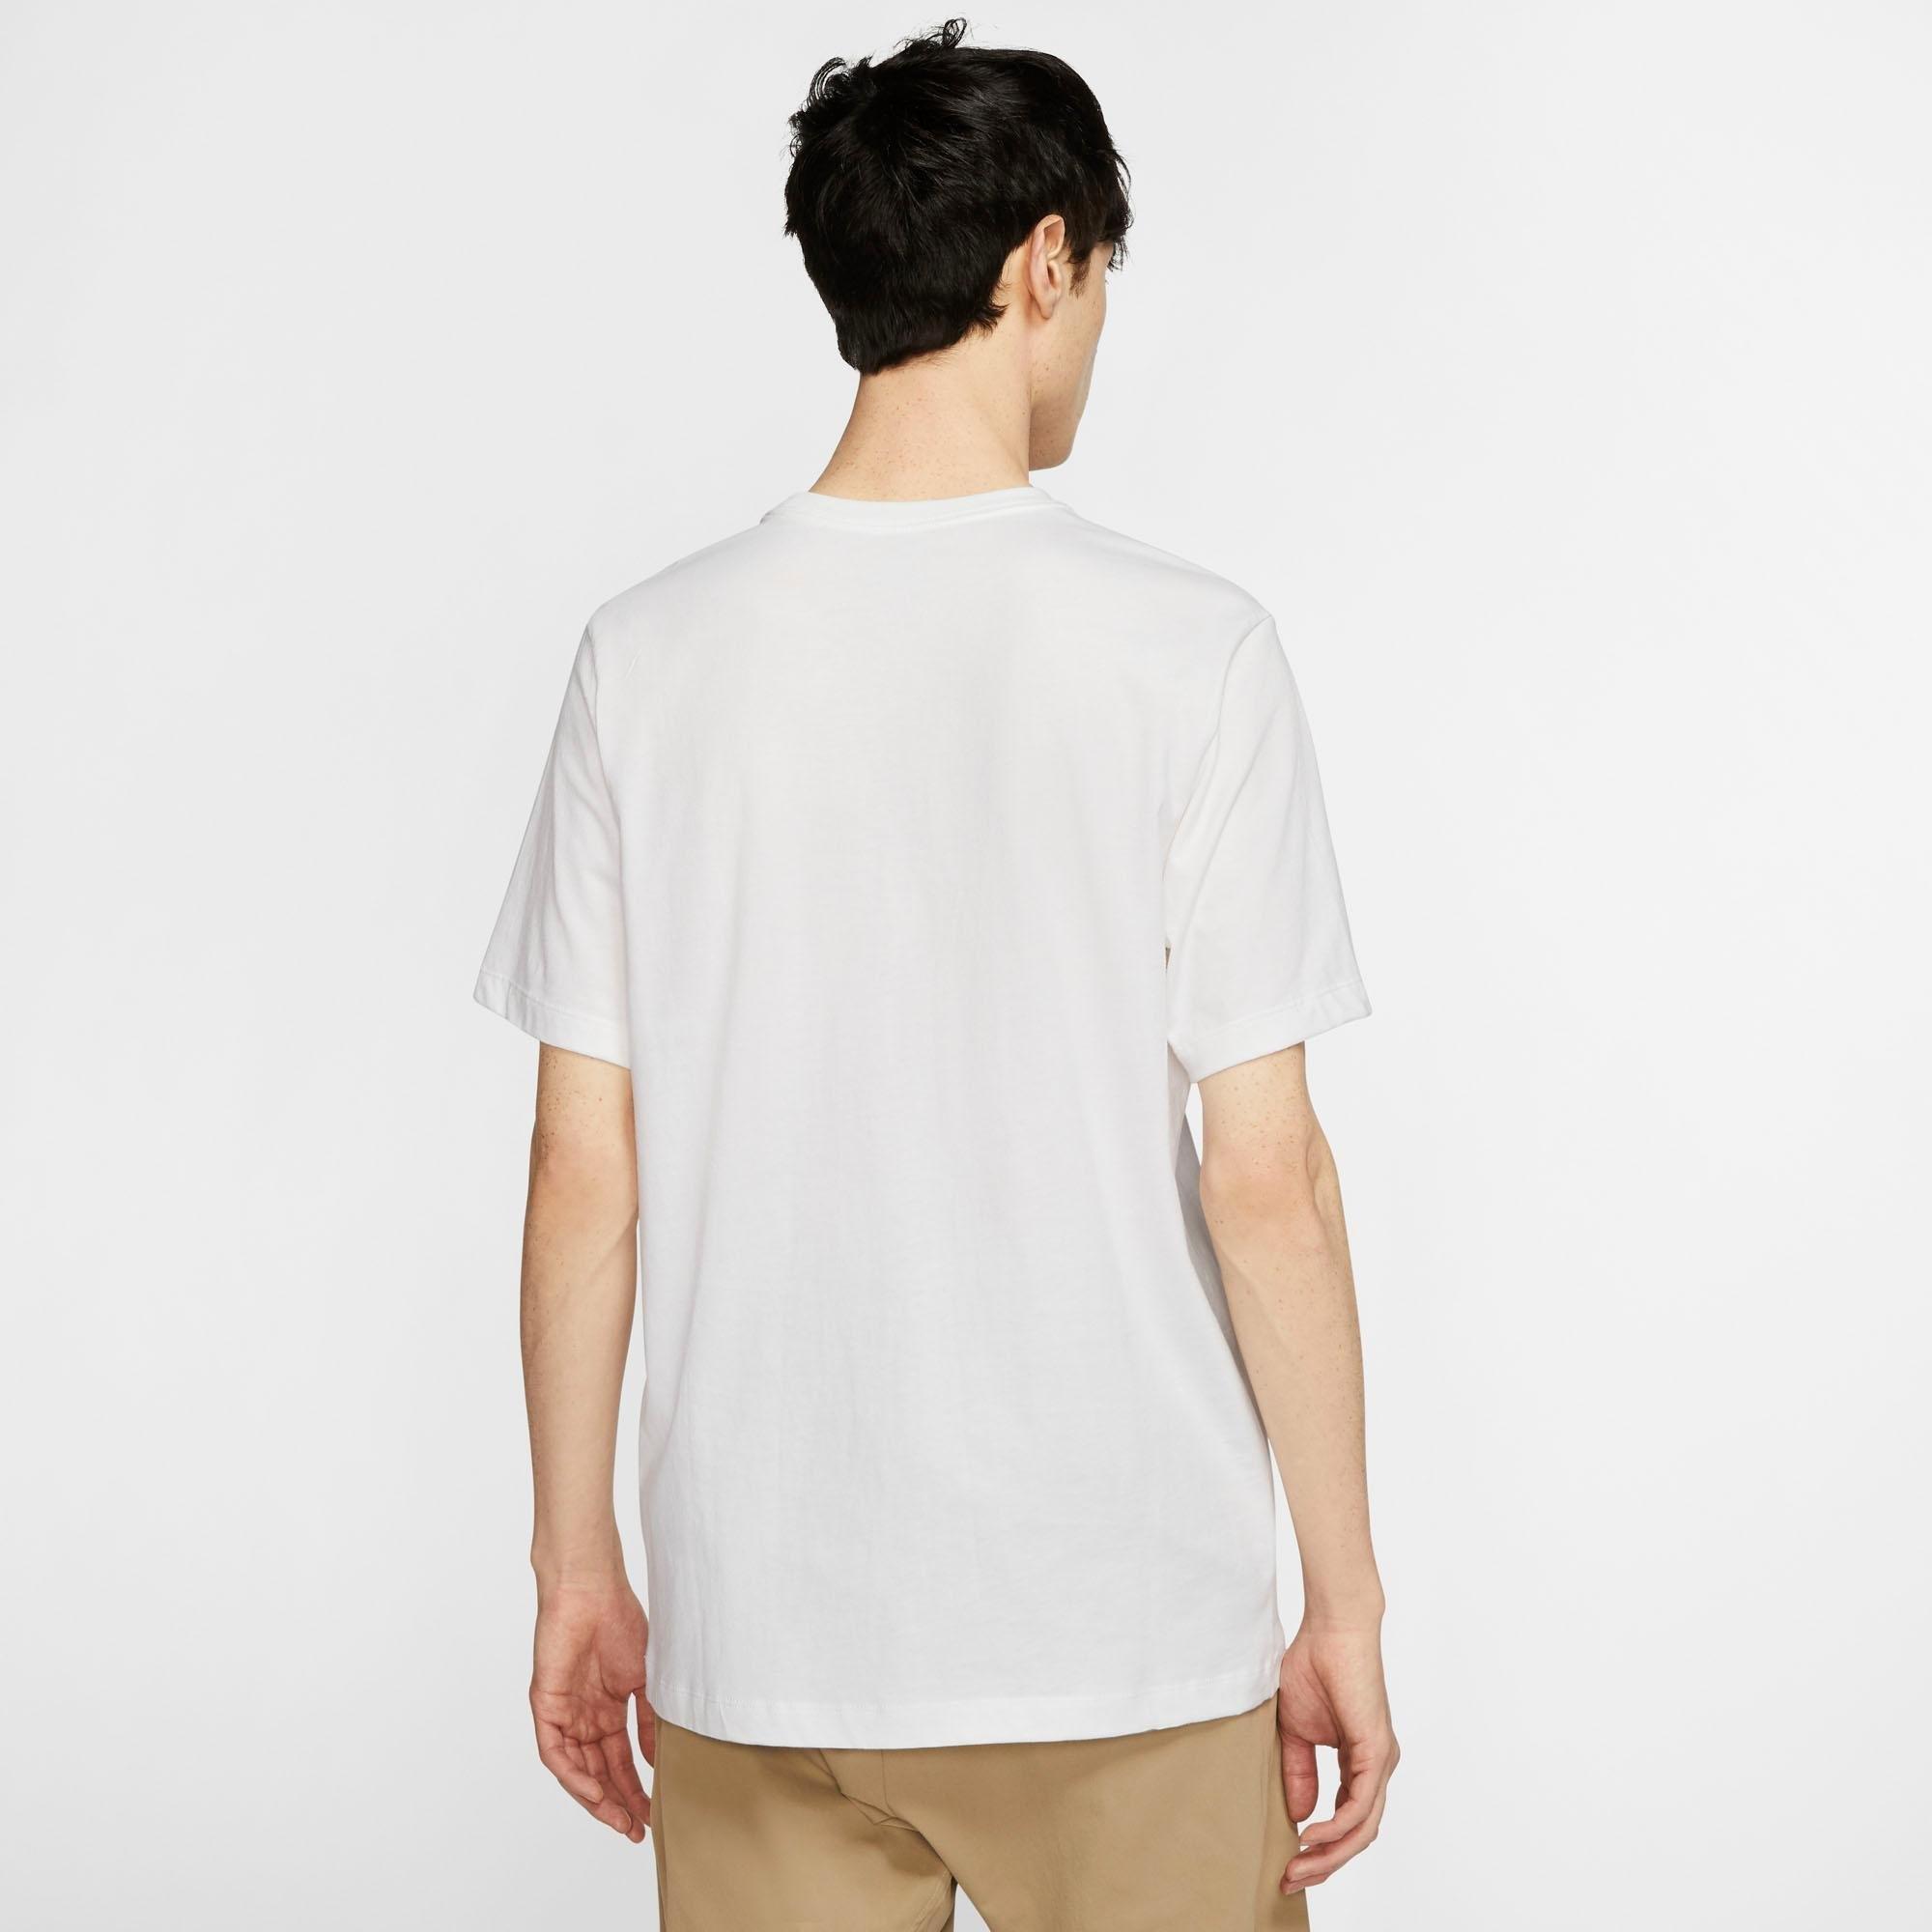 Nike T-shirt »Nike Sportswear (3) Men's T-shirt« in de webshop van OTTO kopen